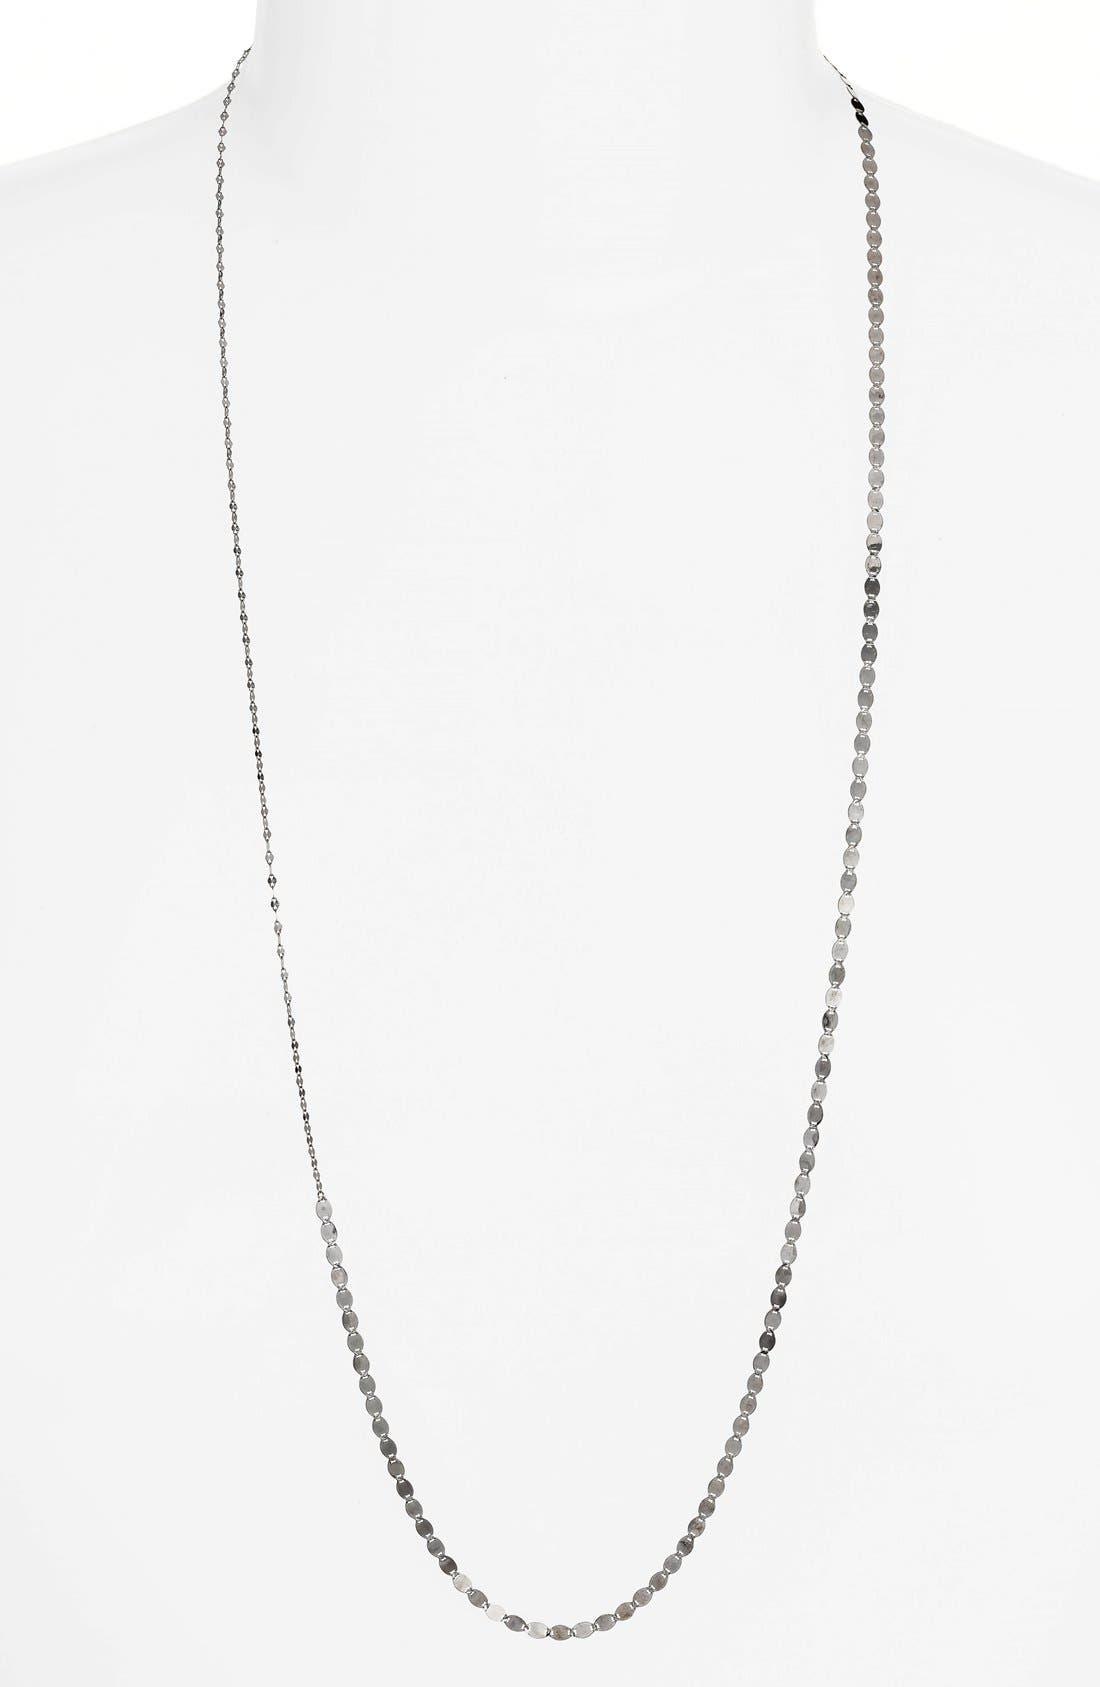 Lana Jewelry 'Long Vanity' Strand Necklace